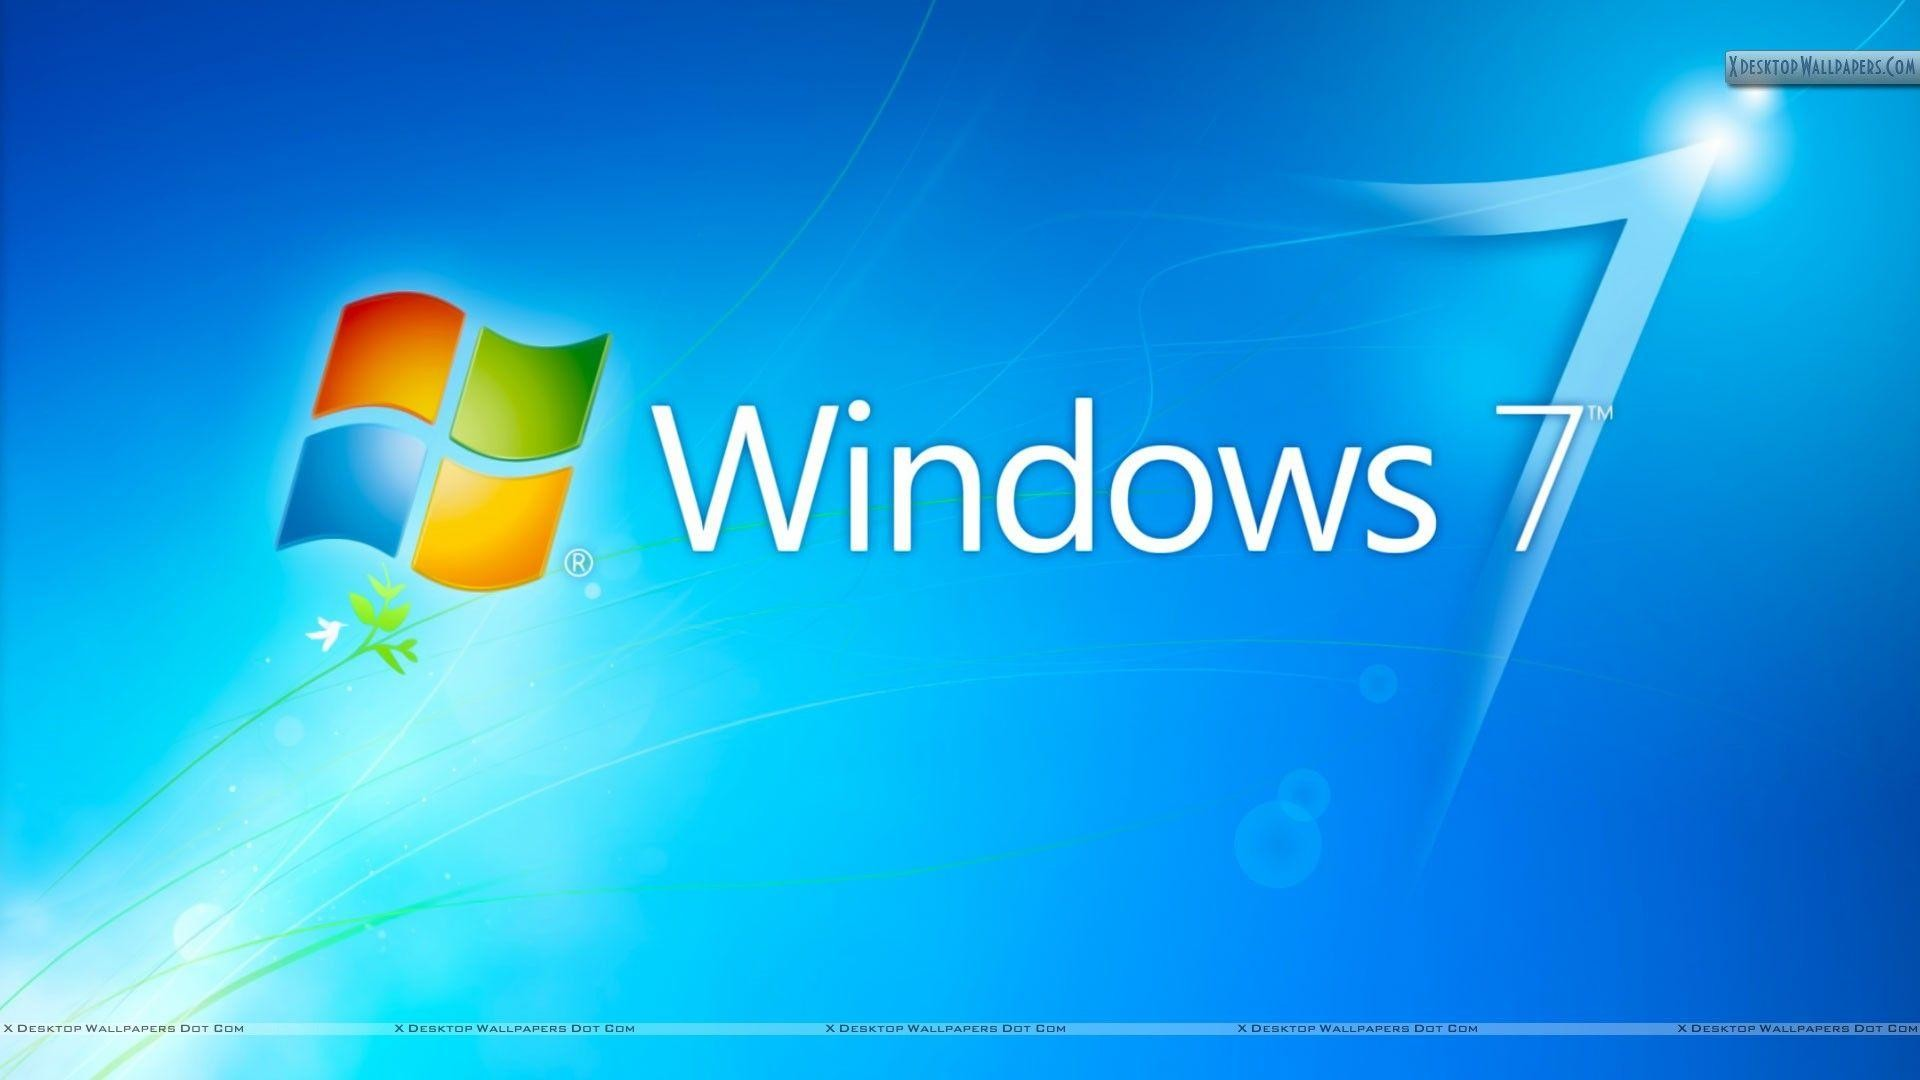 High Resolution Microsoft Windows XP Wallpapers HD 1 Full Size .